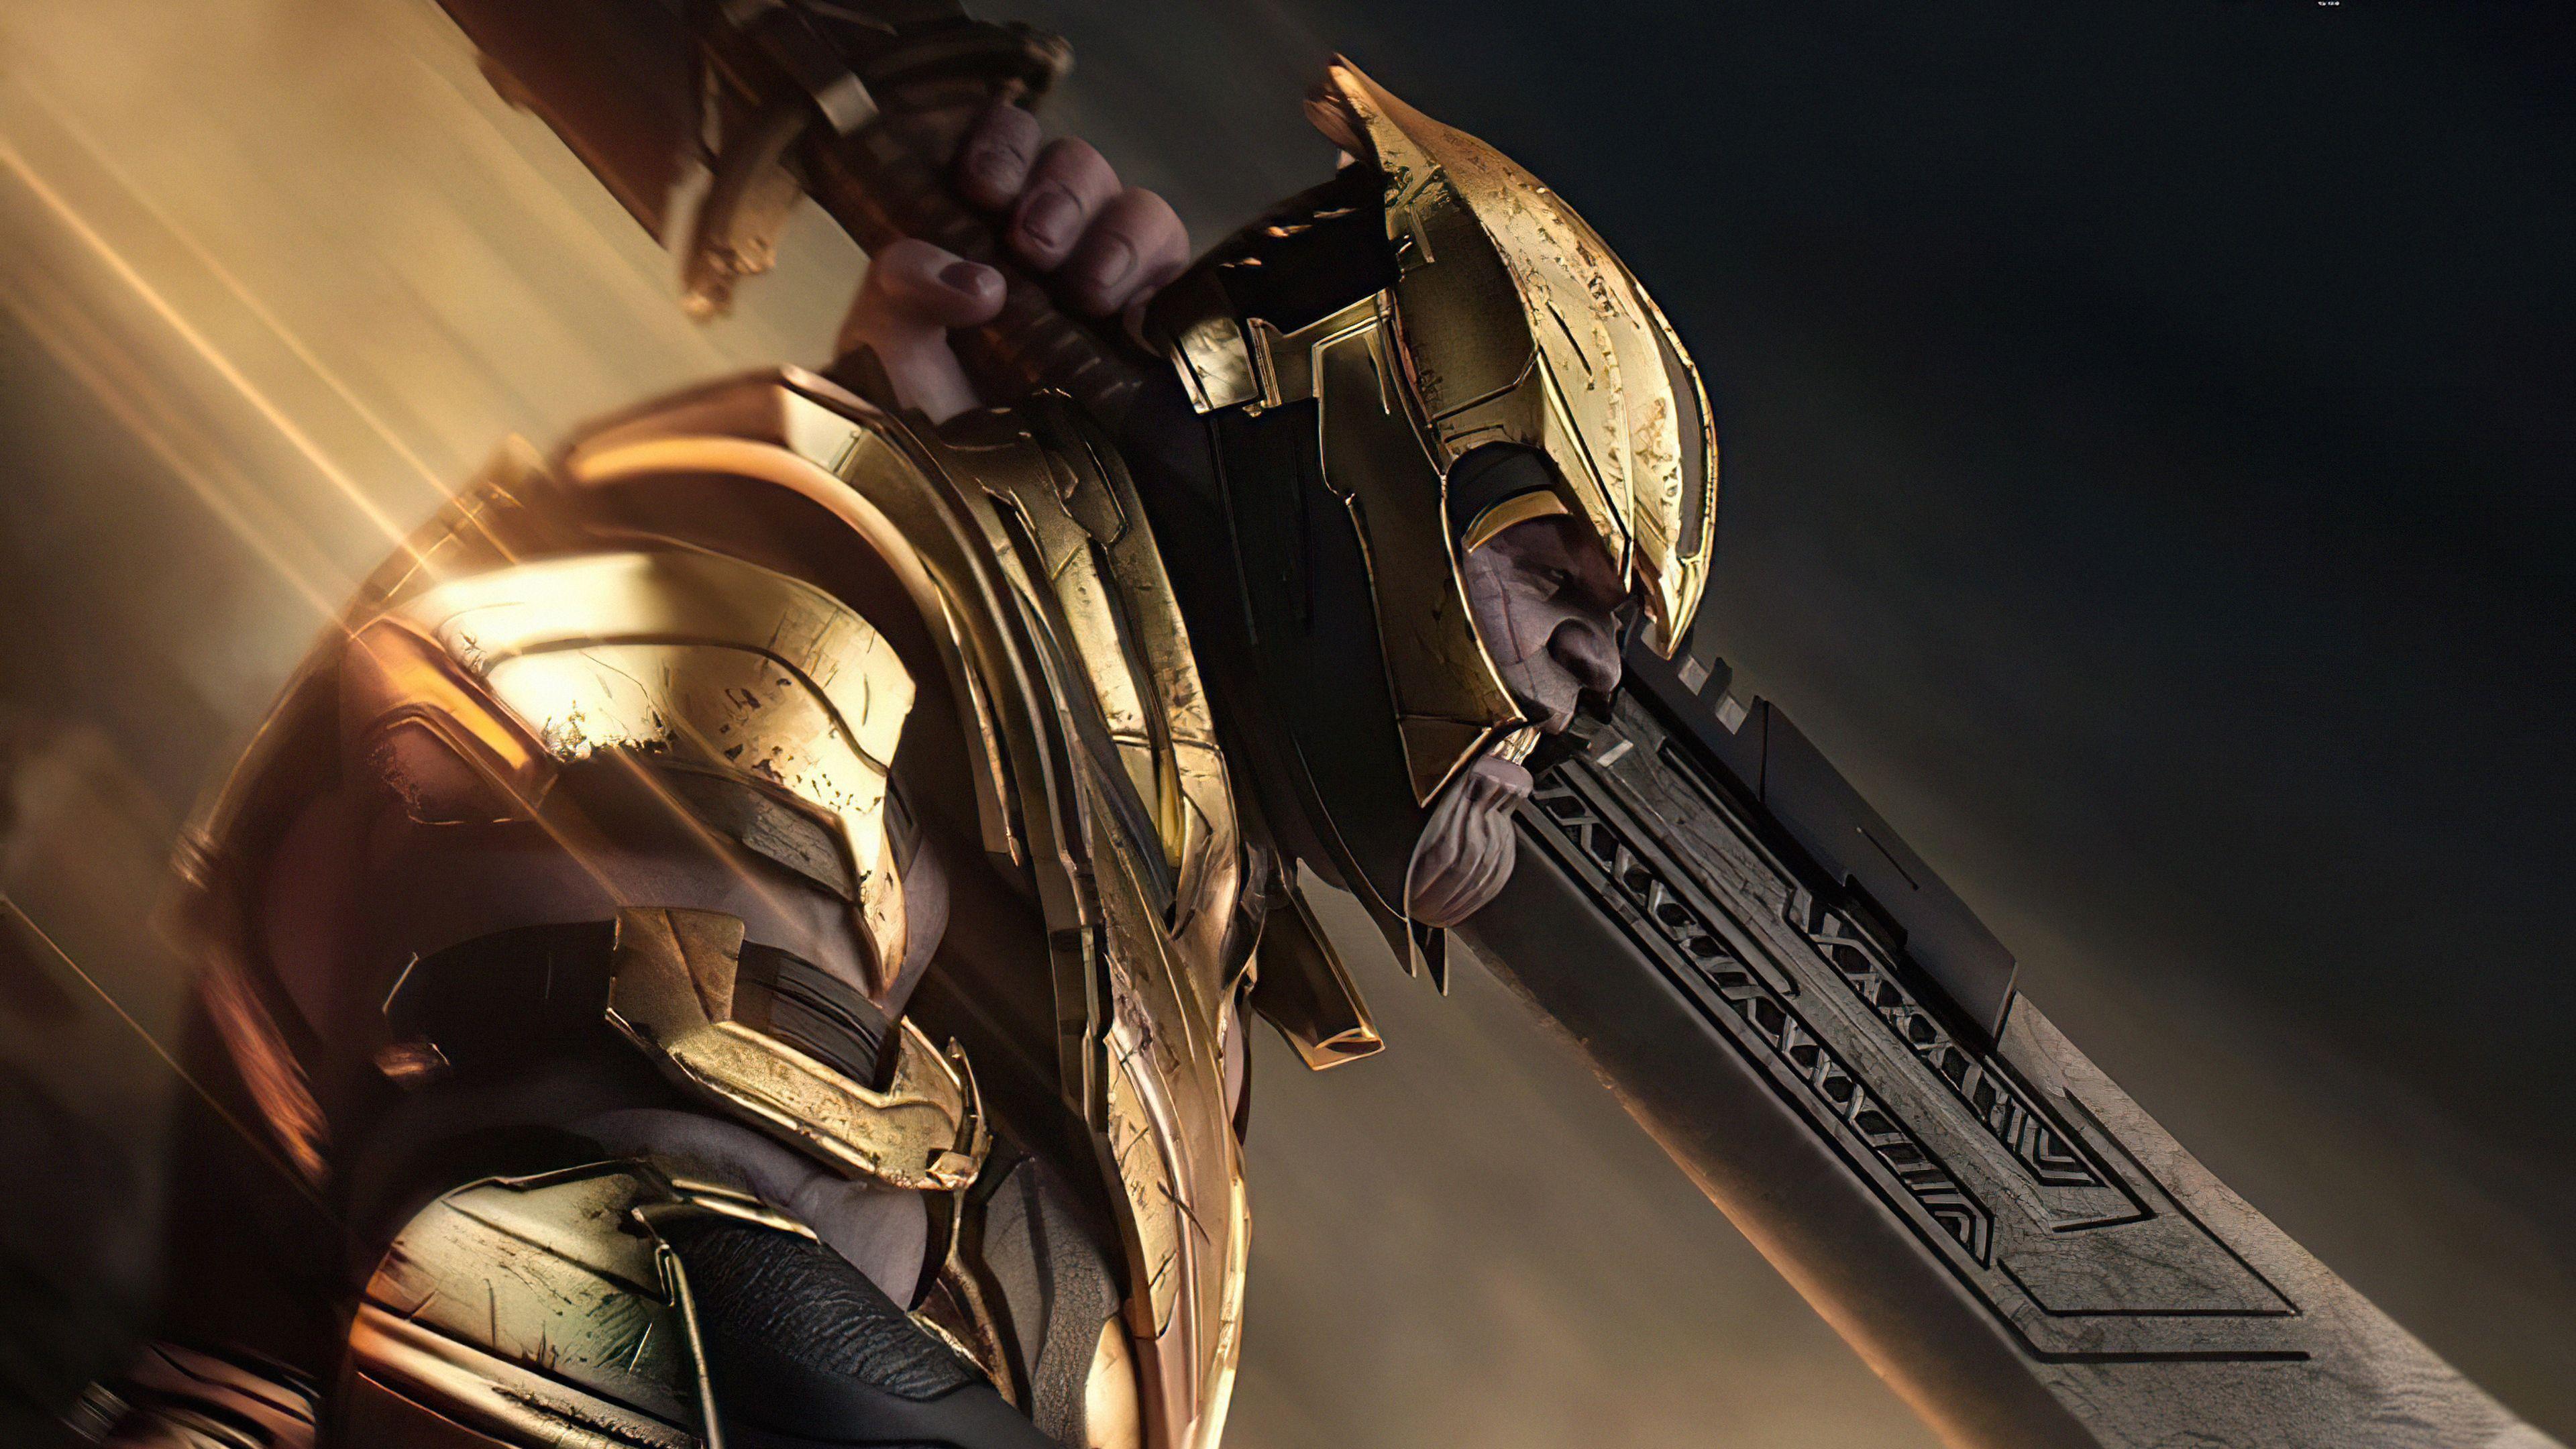 Thanos 2020 Art Thanos 4k Wallpapers Thanos Ultra Hd Wallpaper In 2020 Wallpaper Hero Wallpaper Hd Widescreen Wallpapers